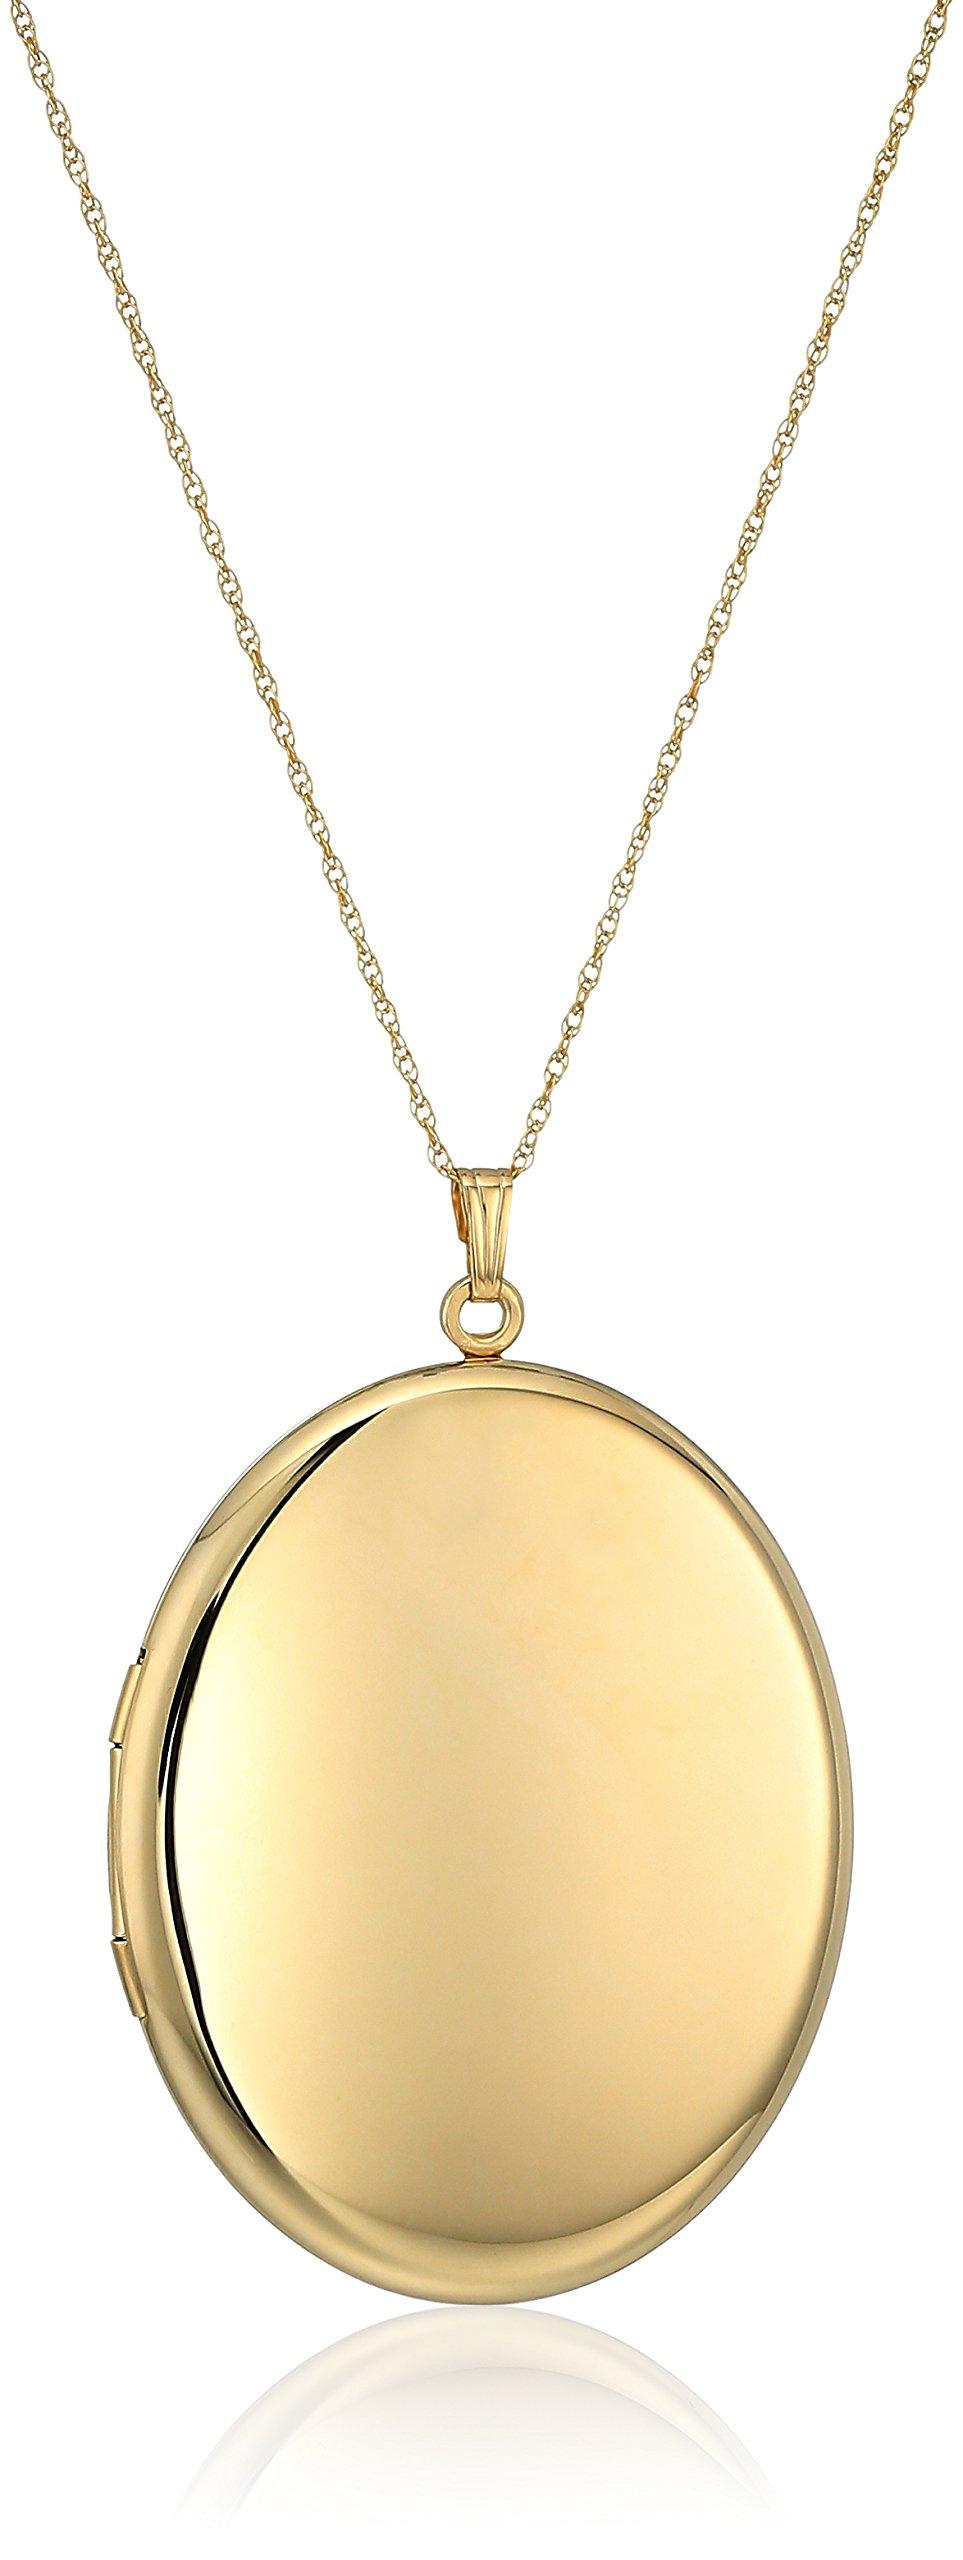 14k Gold-Filled Extra-Large Polished Finish Oval Locket Necklace, 30''